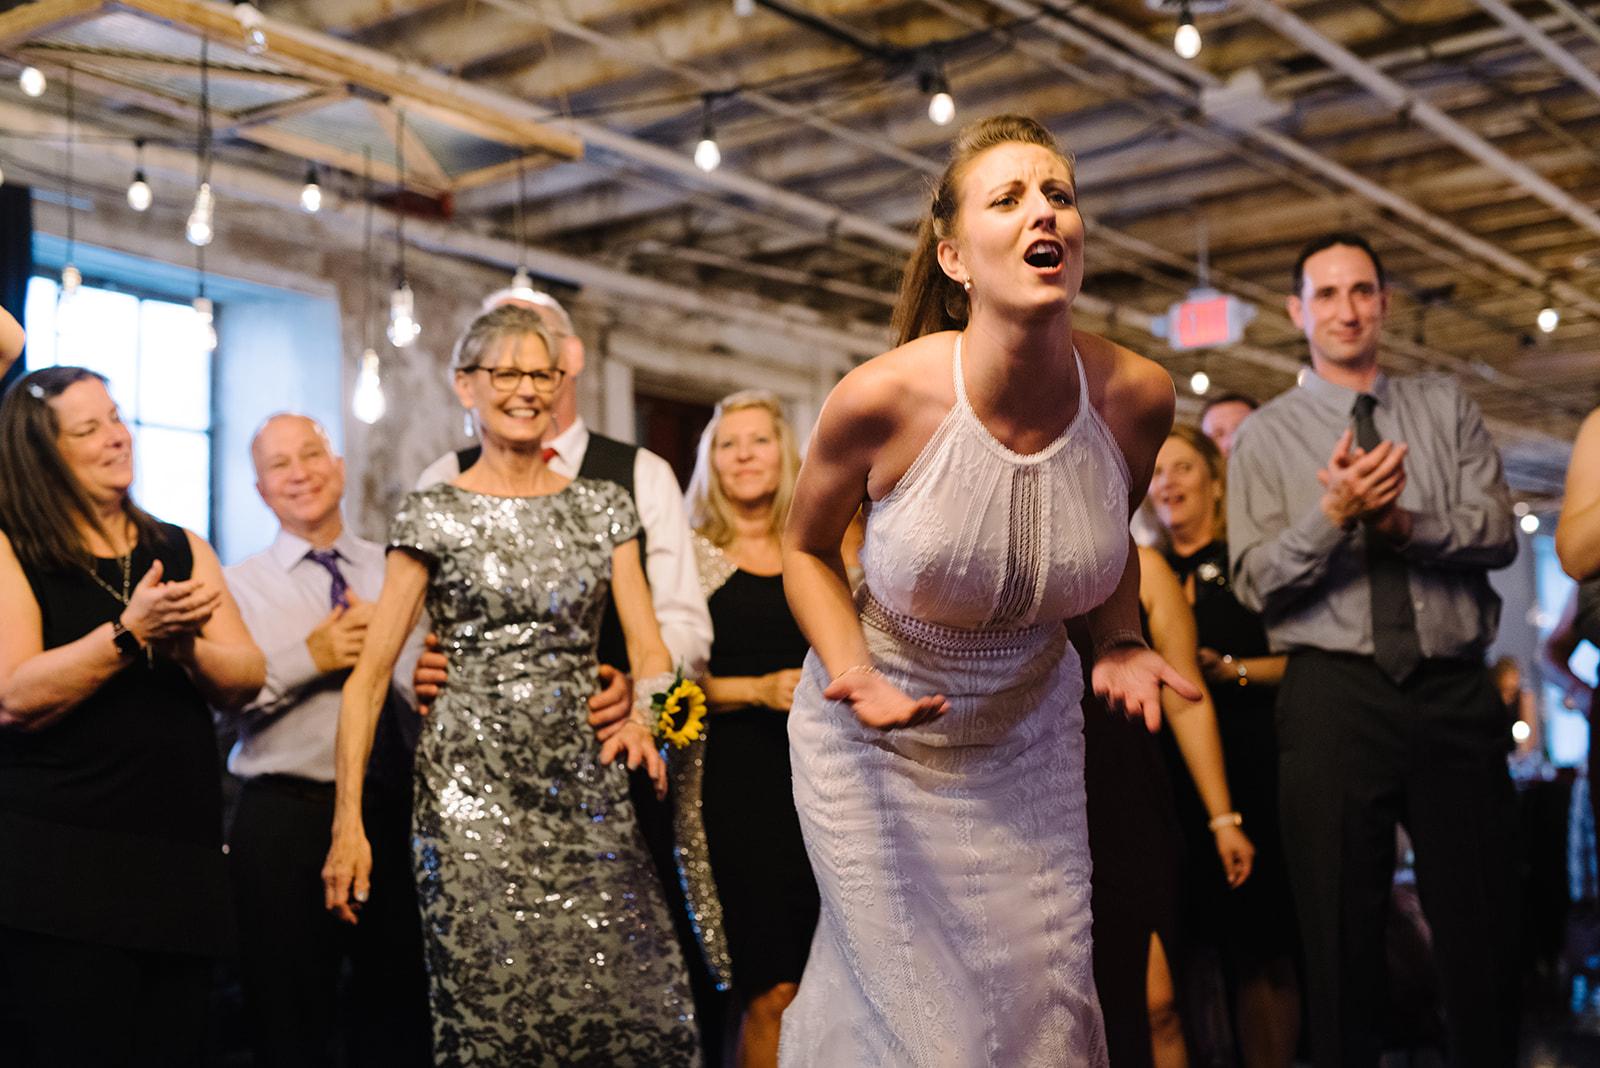 Art Factory Wedding- Industrial Chic- Audrey+Ryan- Paterson NJ- Olivia Christina Photo (60).jpg